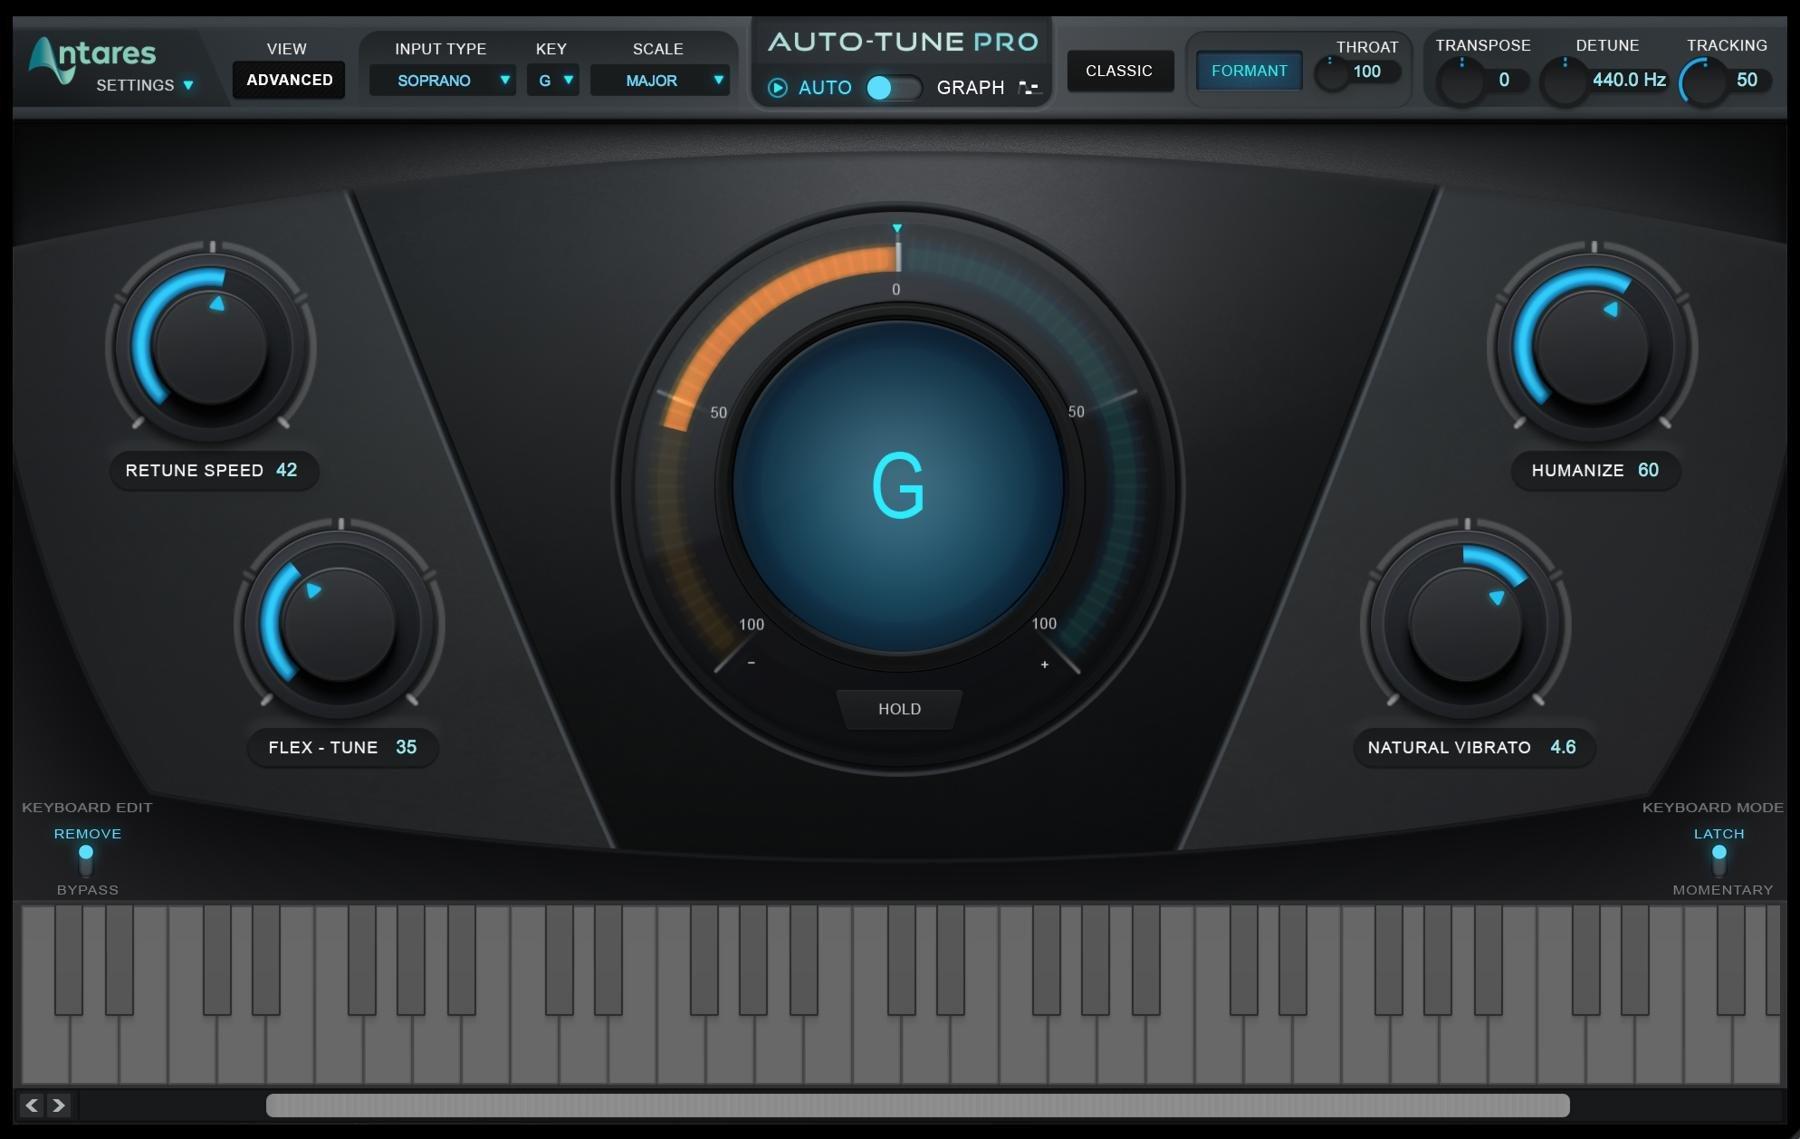 Antares Autotune Pro latest version